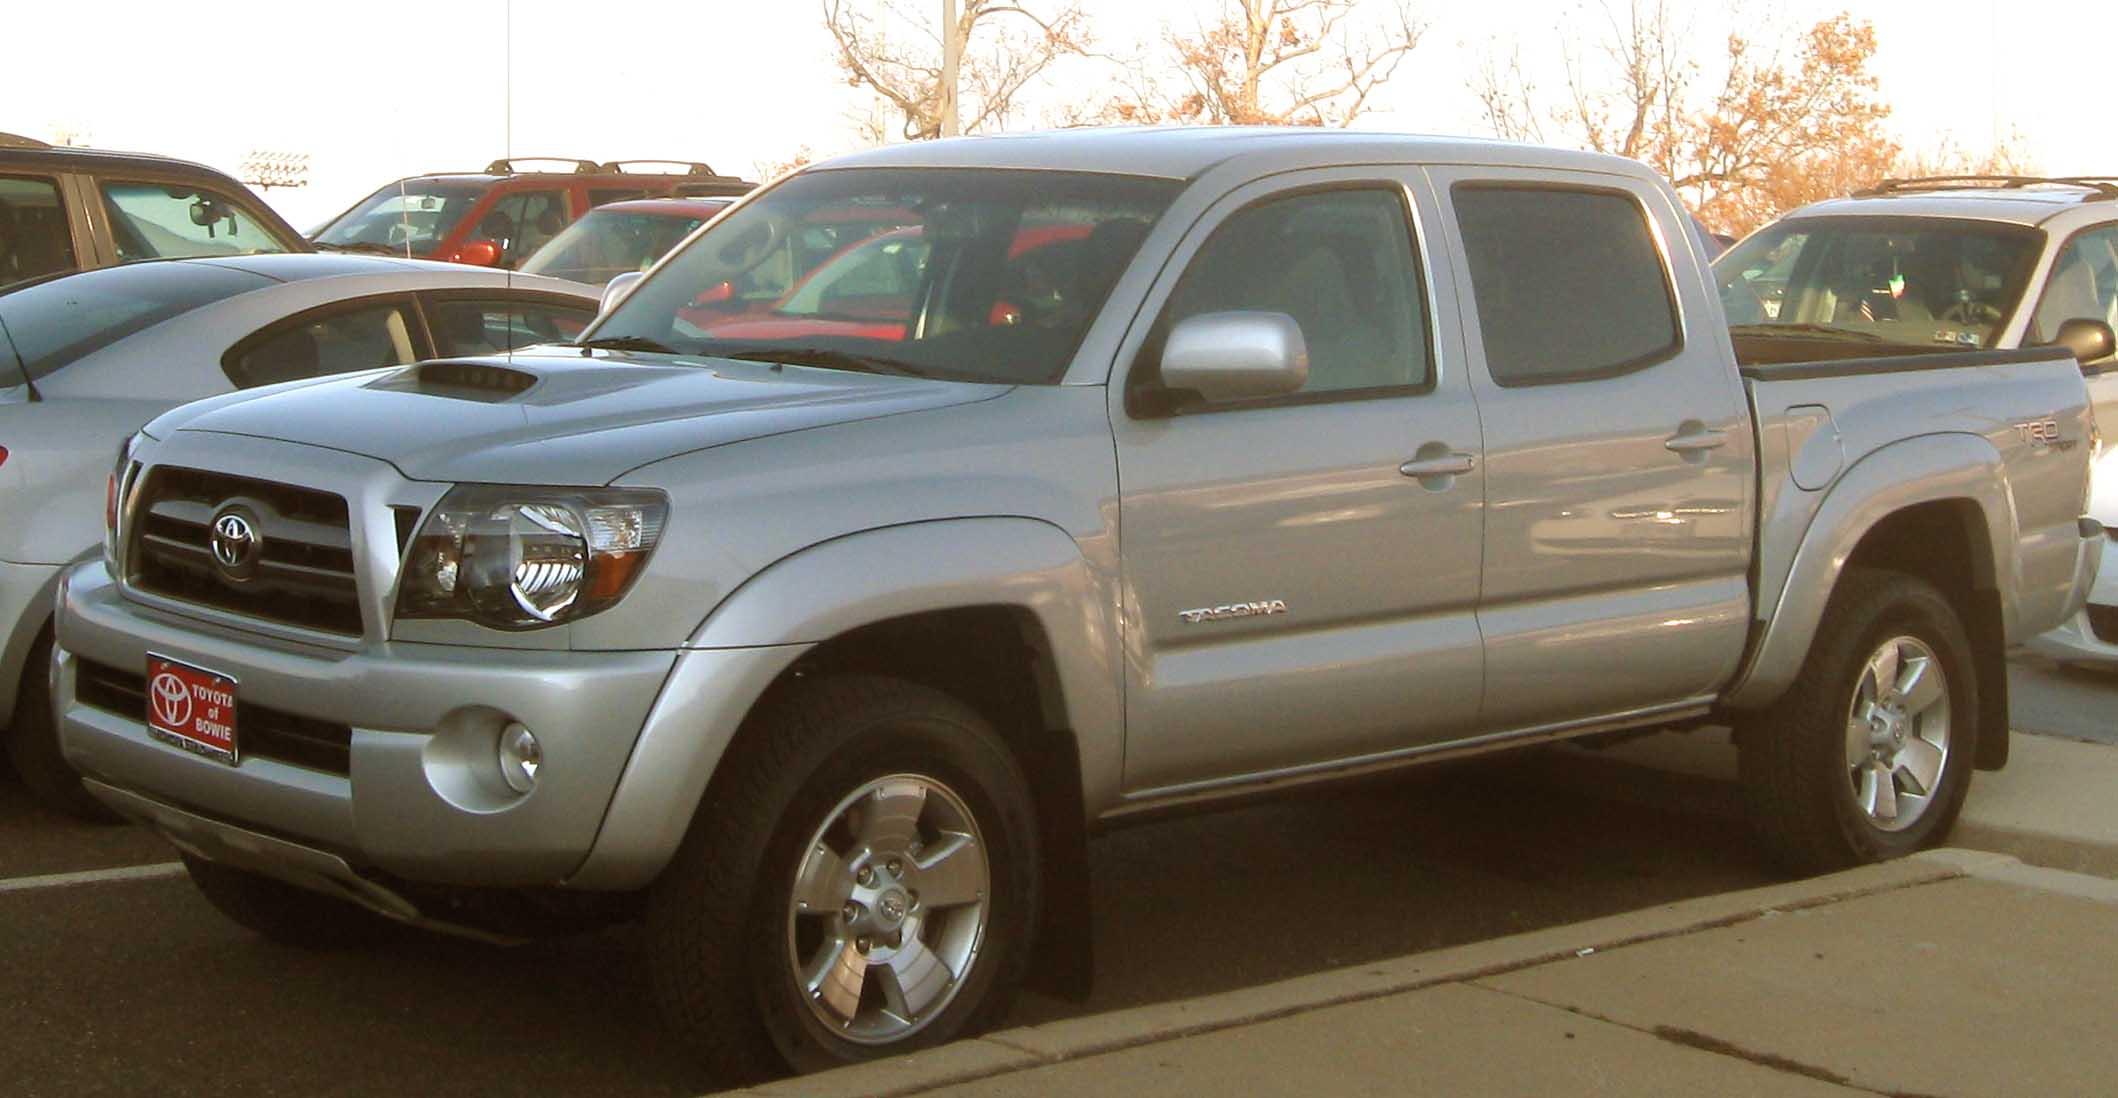 Toyota Tacoma  For Sale Long Beach Ca